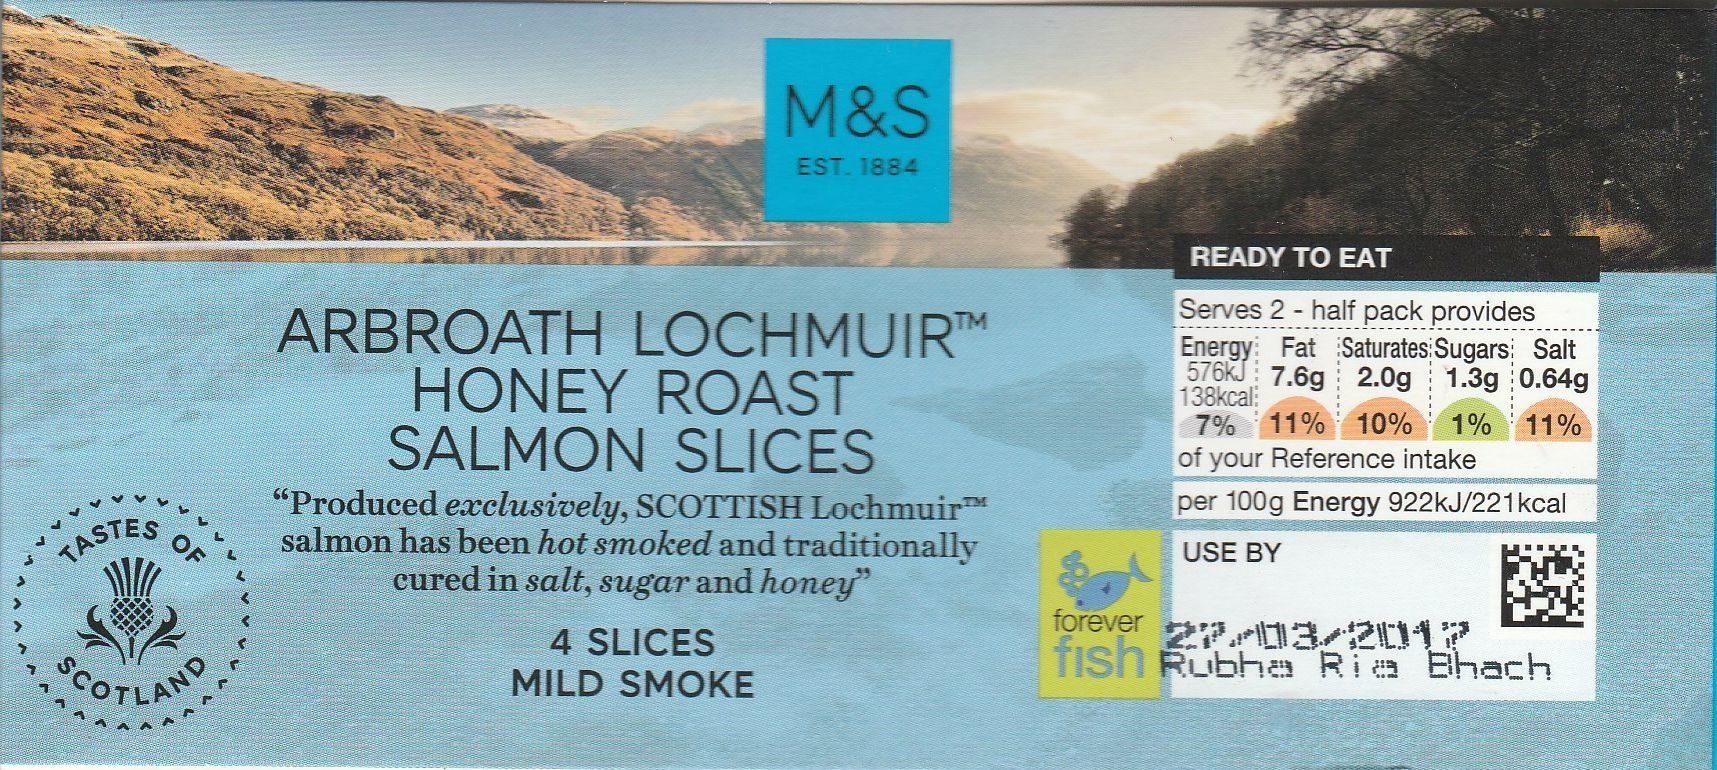 Arbroath Lochmuir Honey Roast Salmon Slices - Product - fr